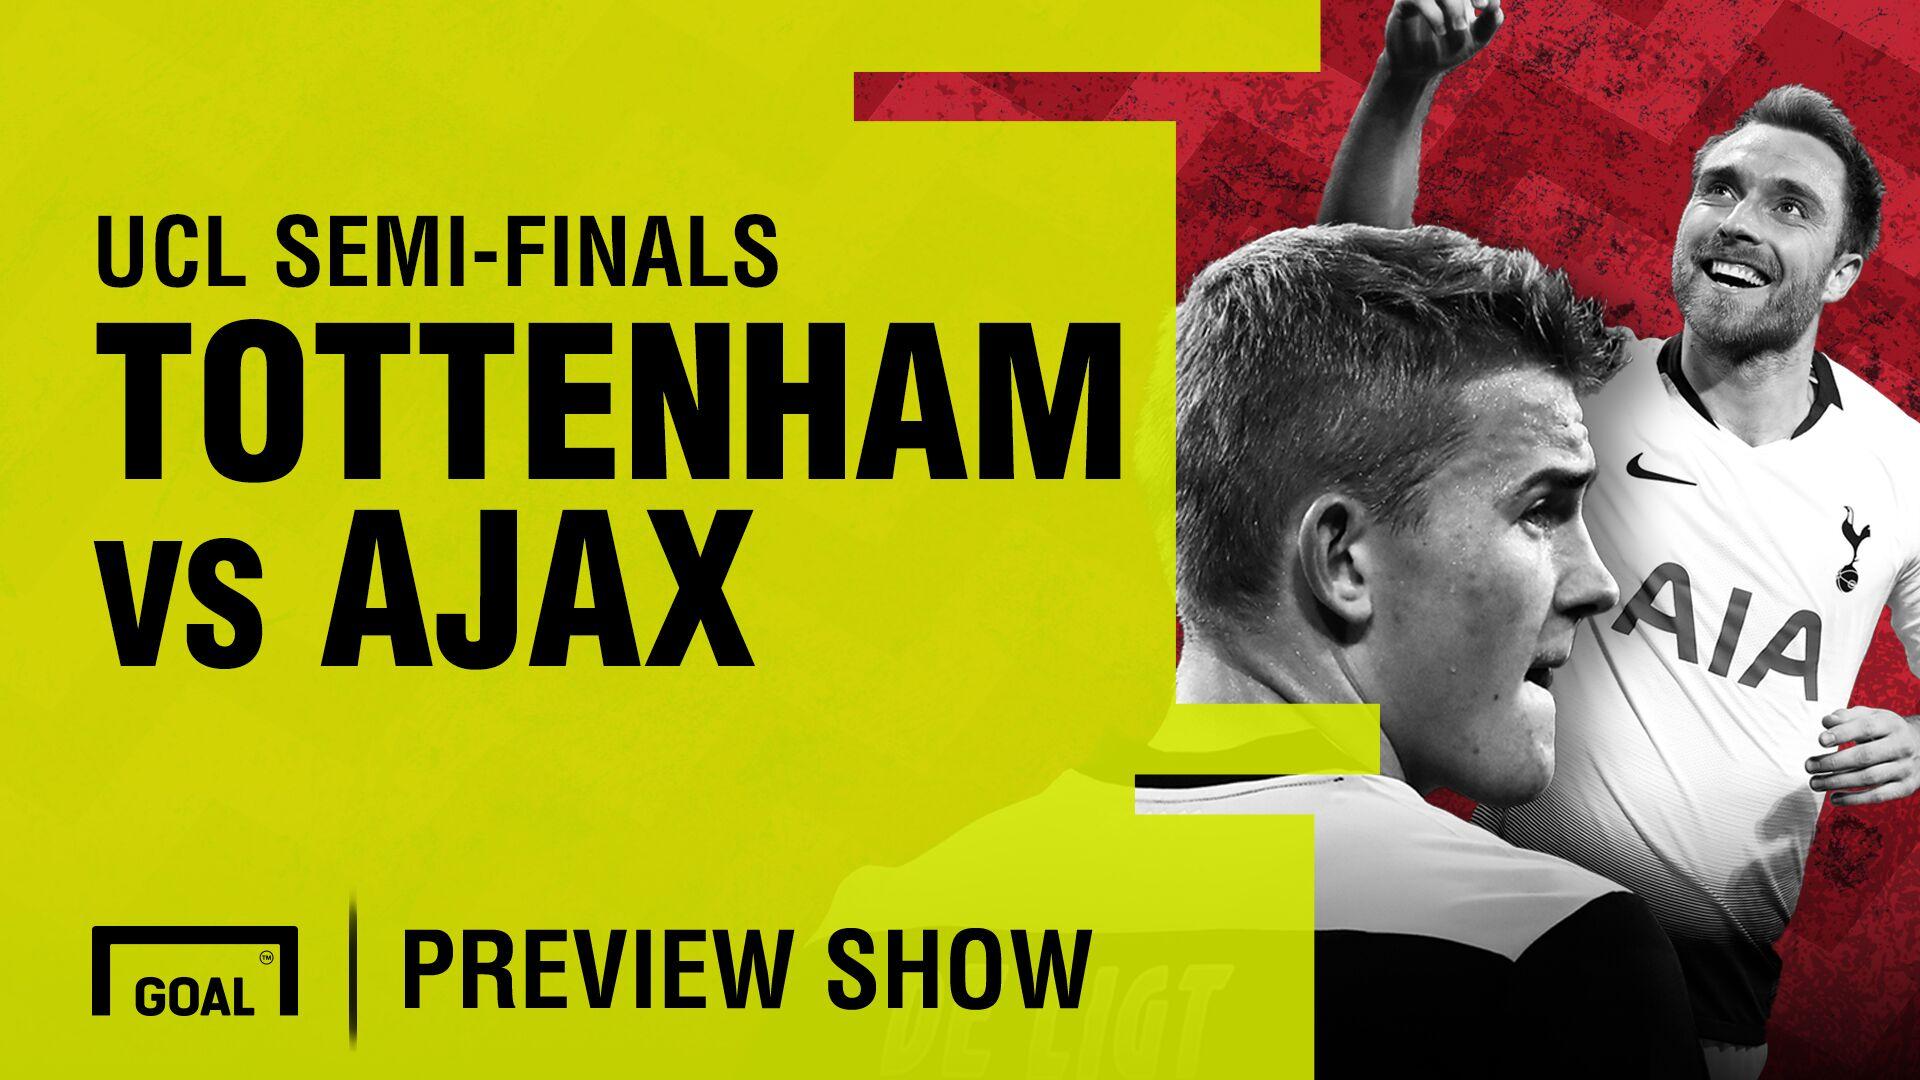 Tottenham 0-1 Ajax 4 30 2019 UCL Semi Final Match Highlight